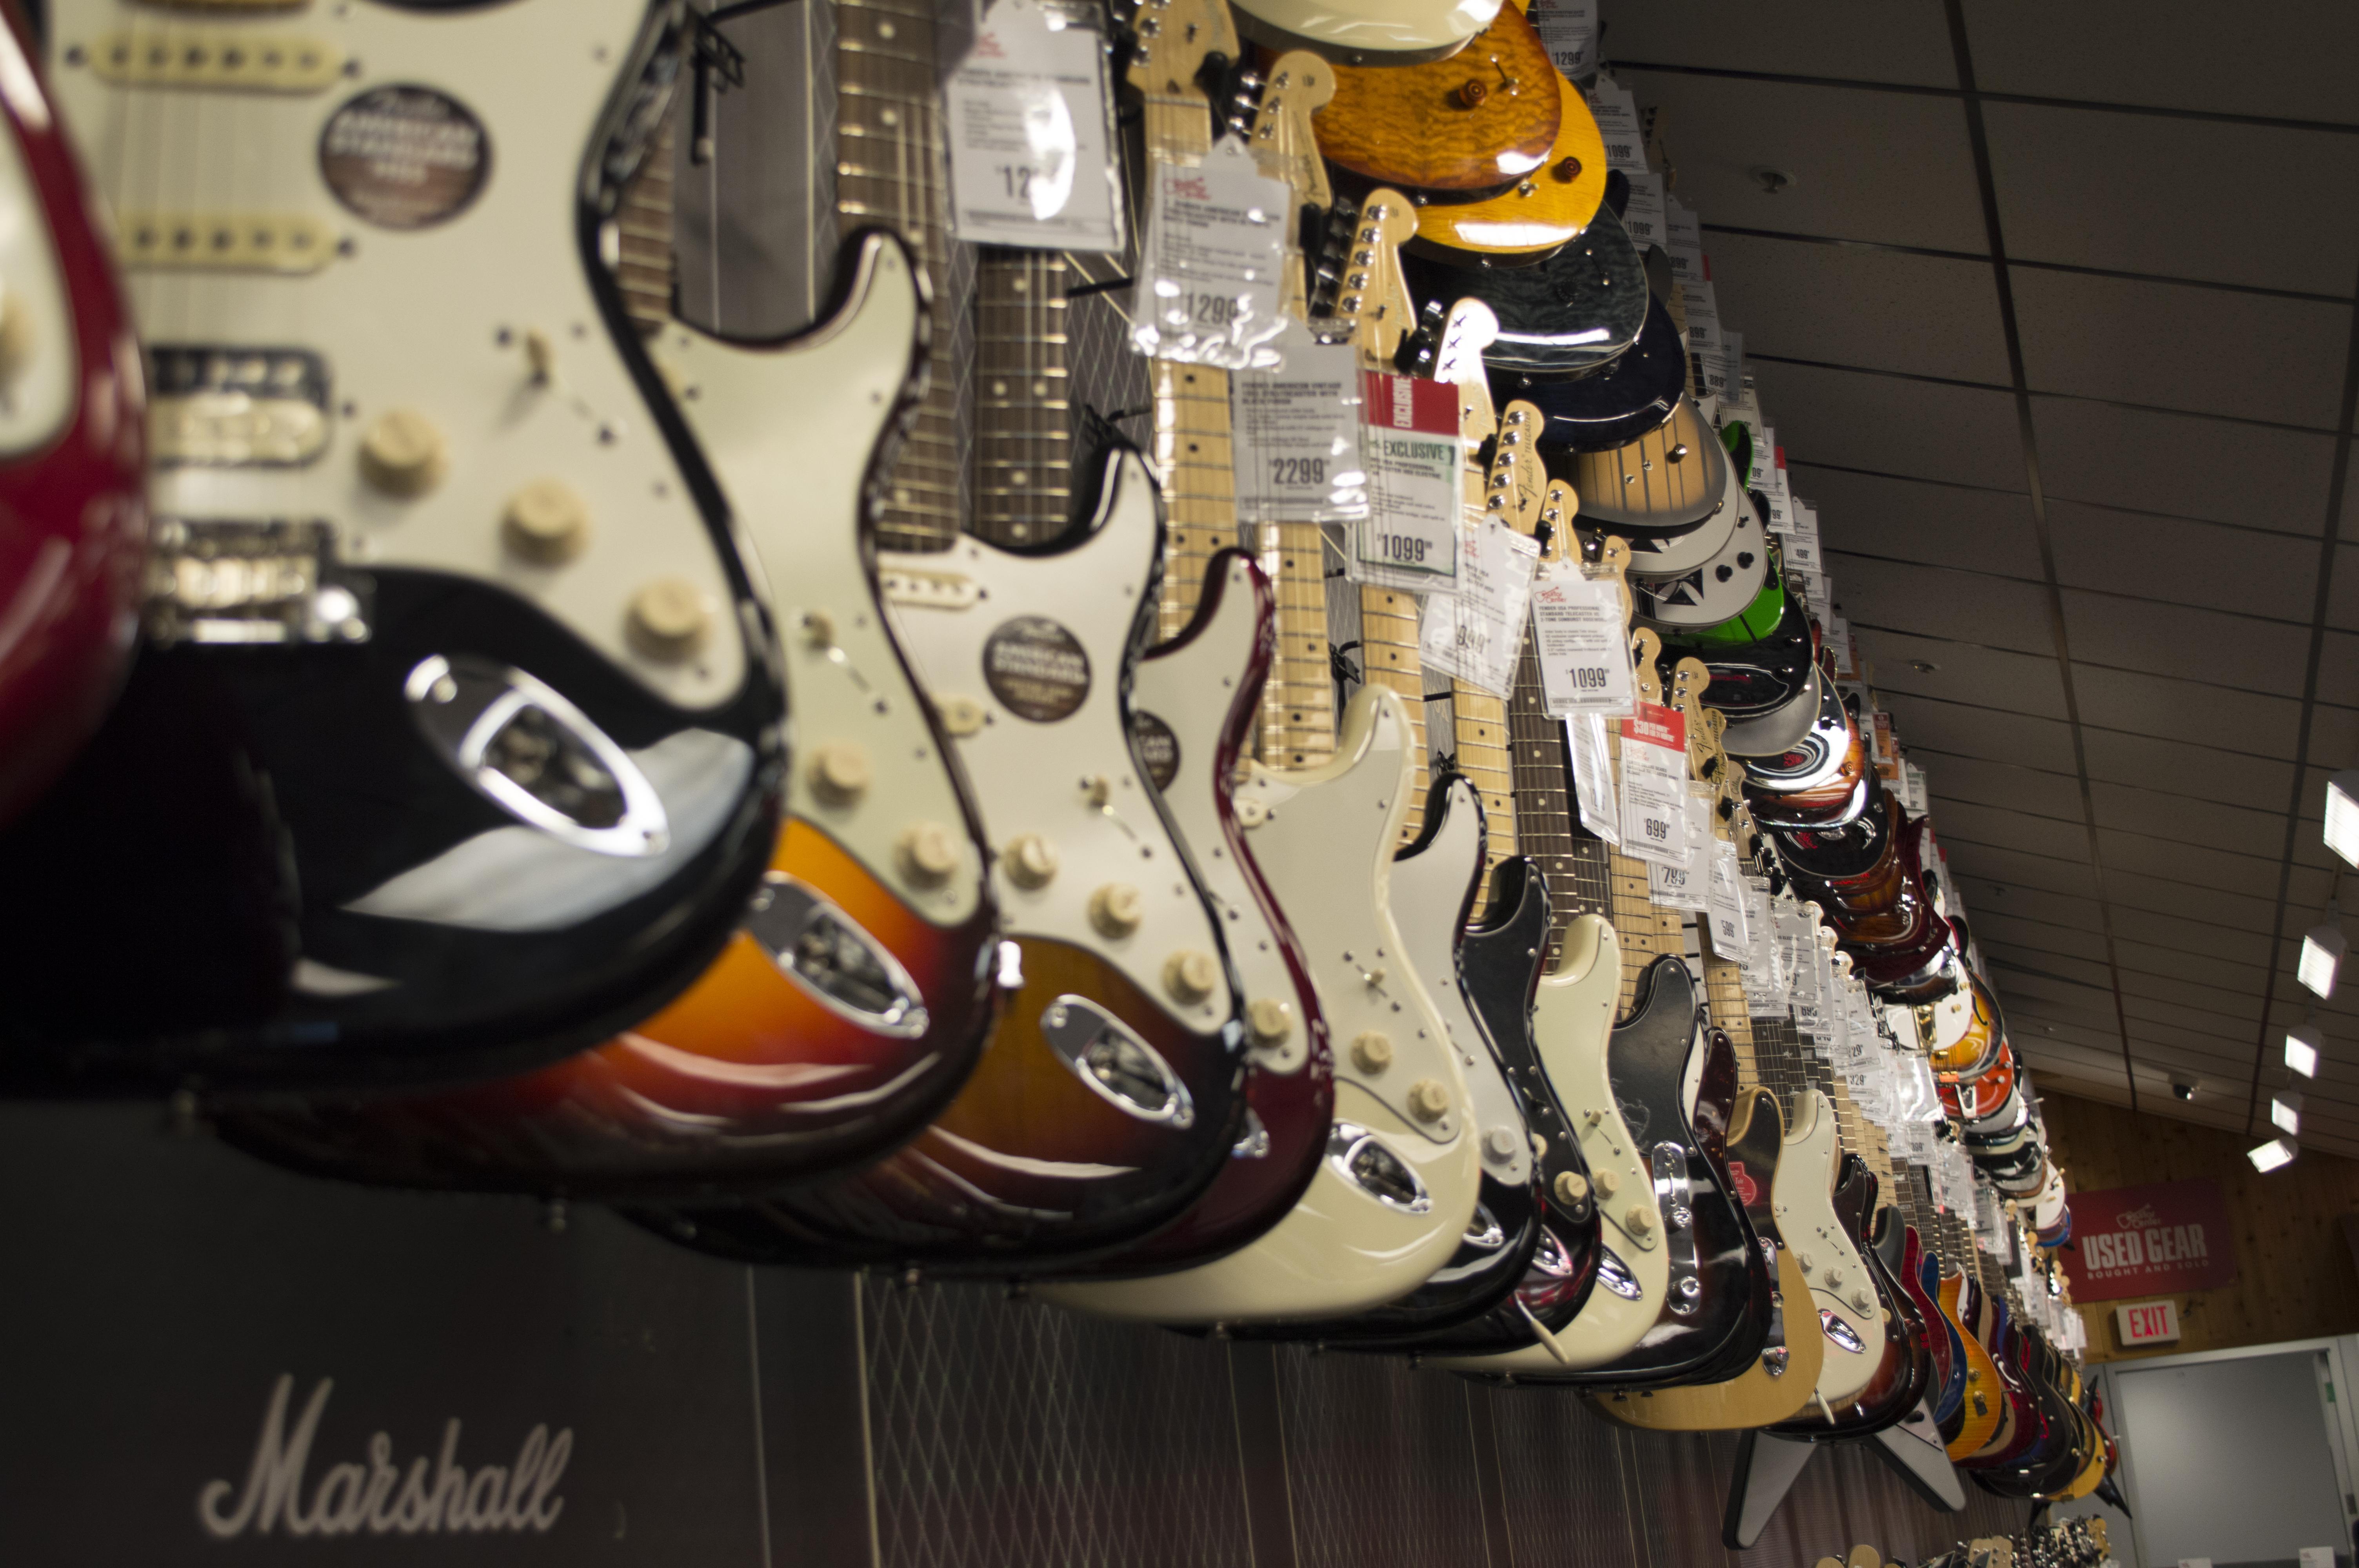 Free Images Music Guitar Vehicle Amp Engine Footwear Fender